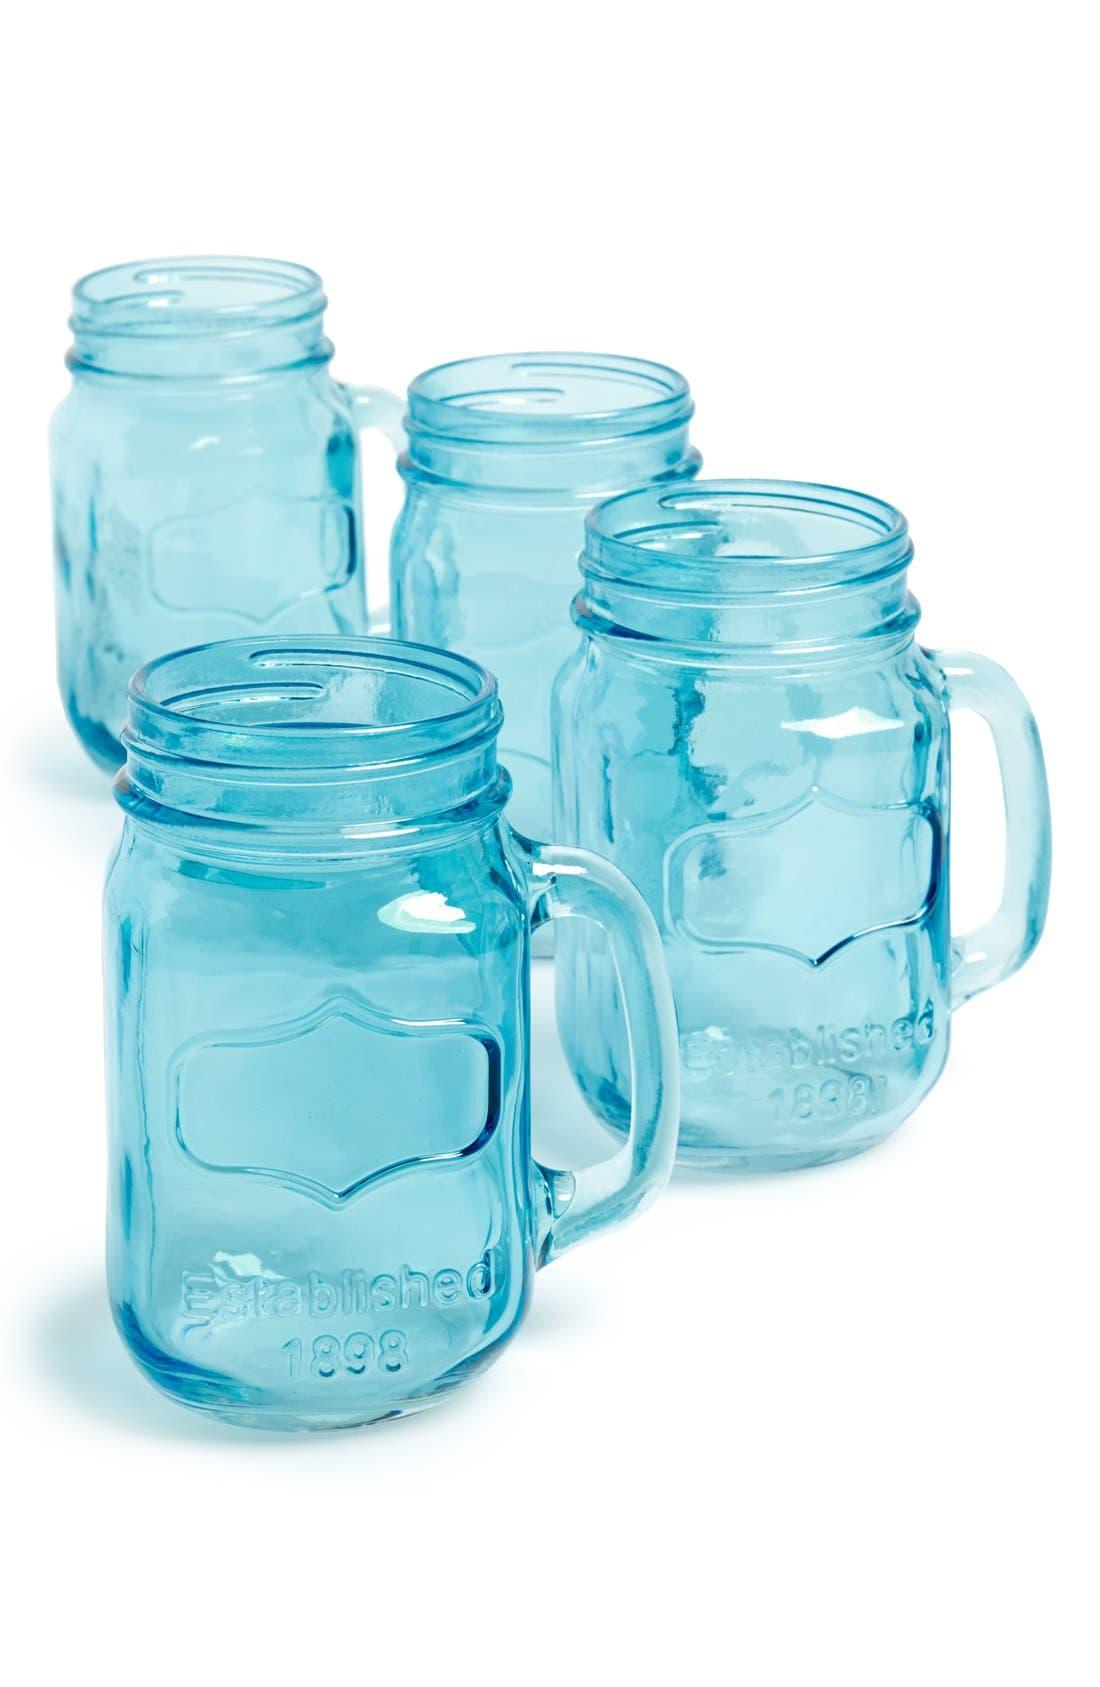 Alternate Image 1 Selected - Circle Glass 'Yorkshire' Mason Jar Mugs (Set of 4)